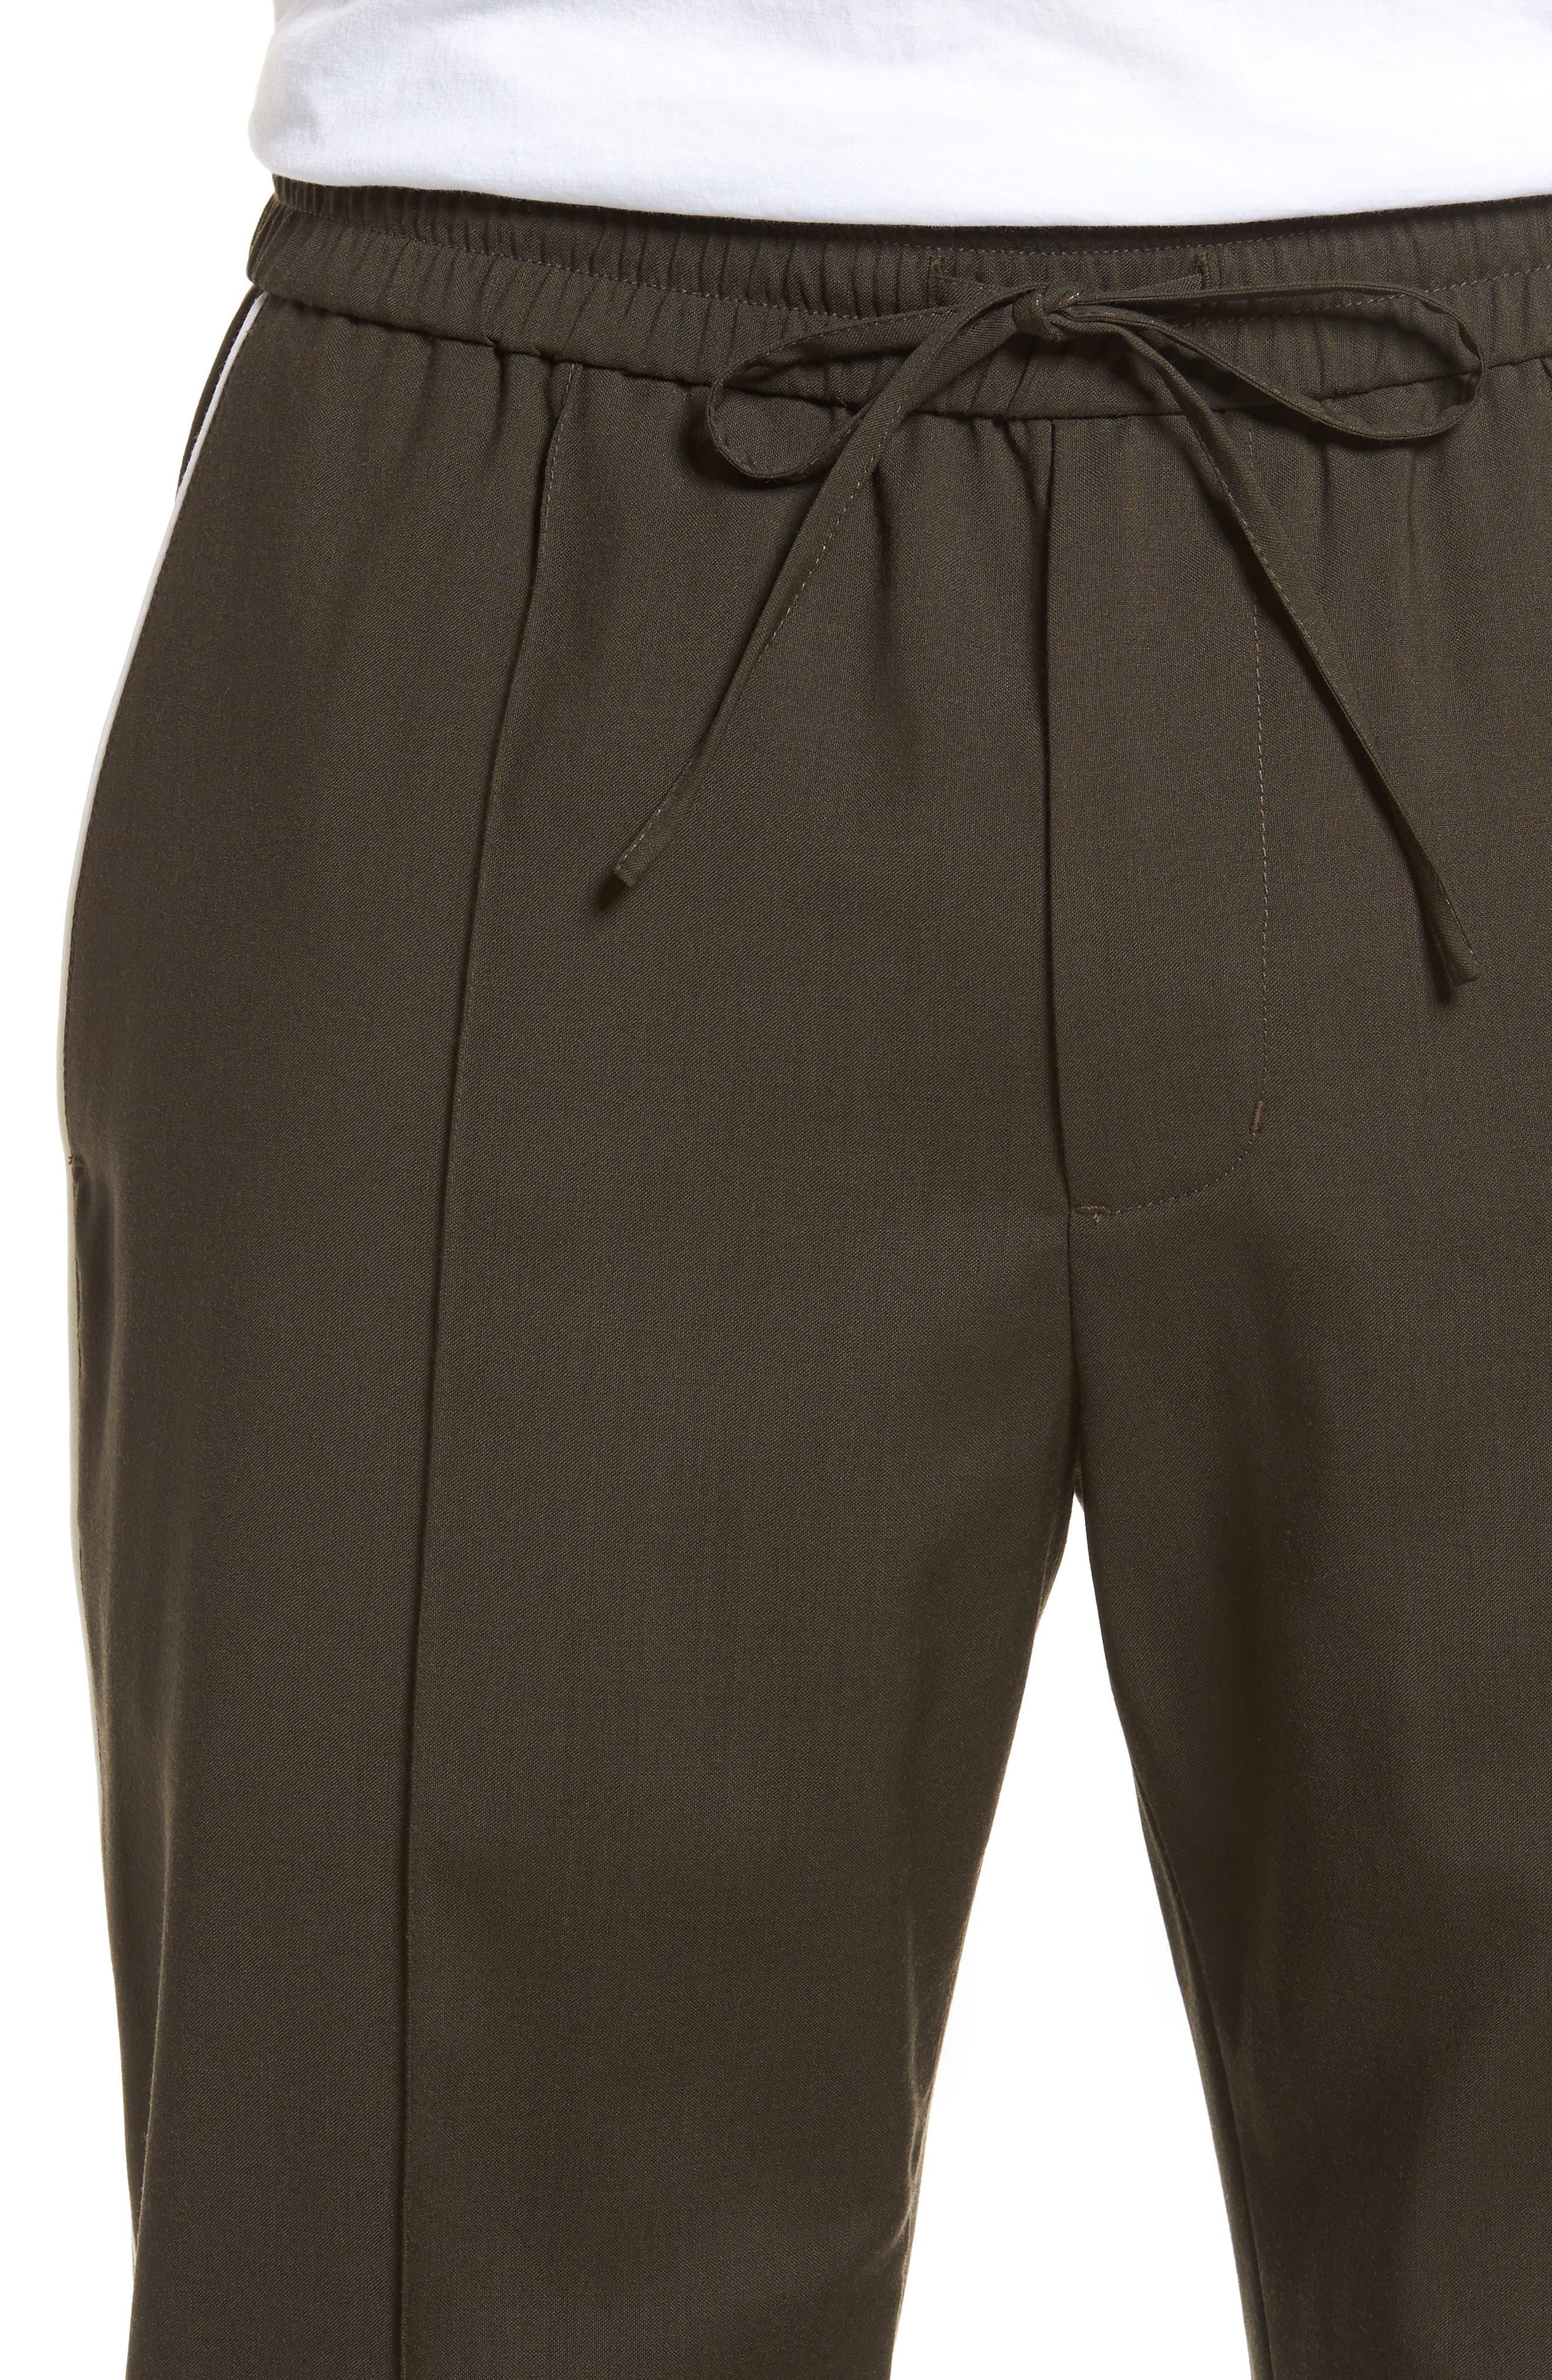 Regular Fit Track Pants,                             Alternate thumbnail 4, color,                             Fatigue